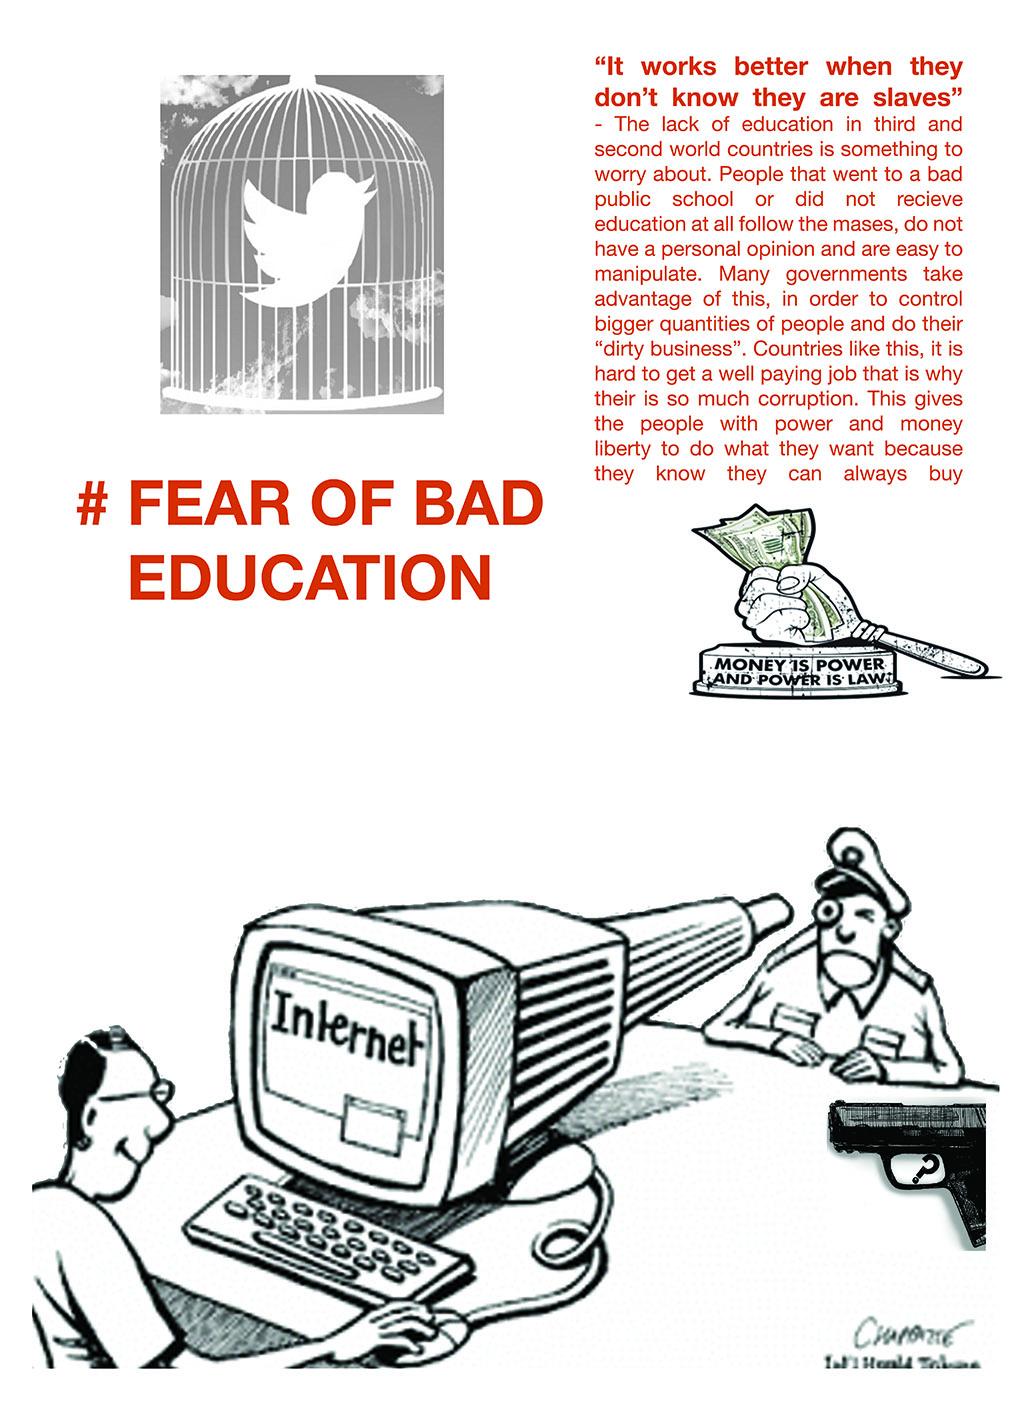 Fear of bad Education1920.jpg